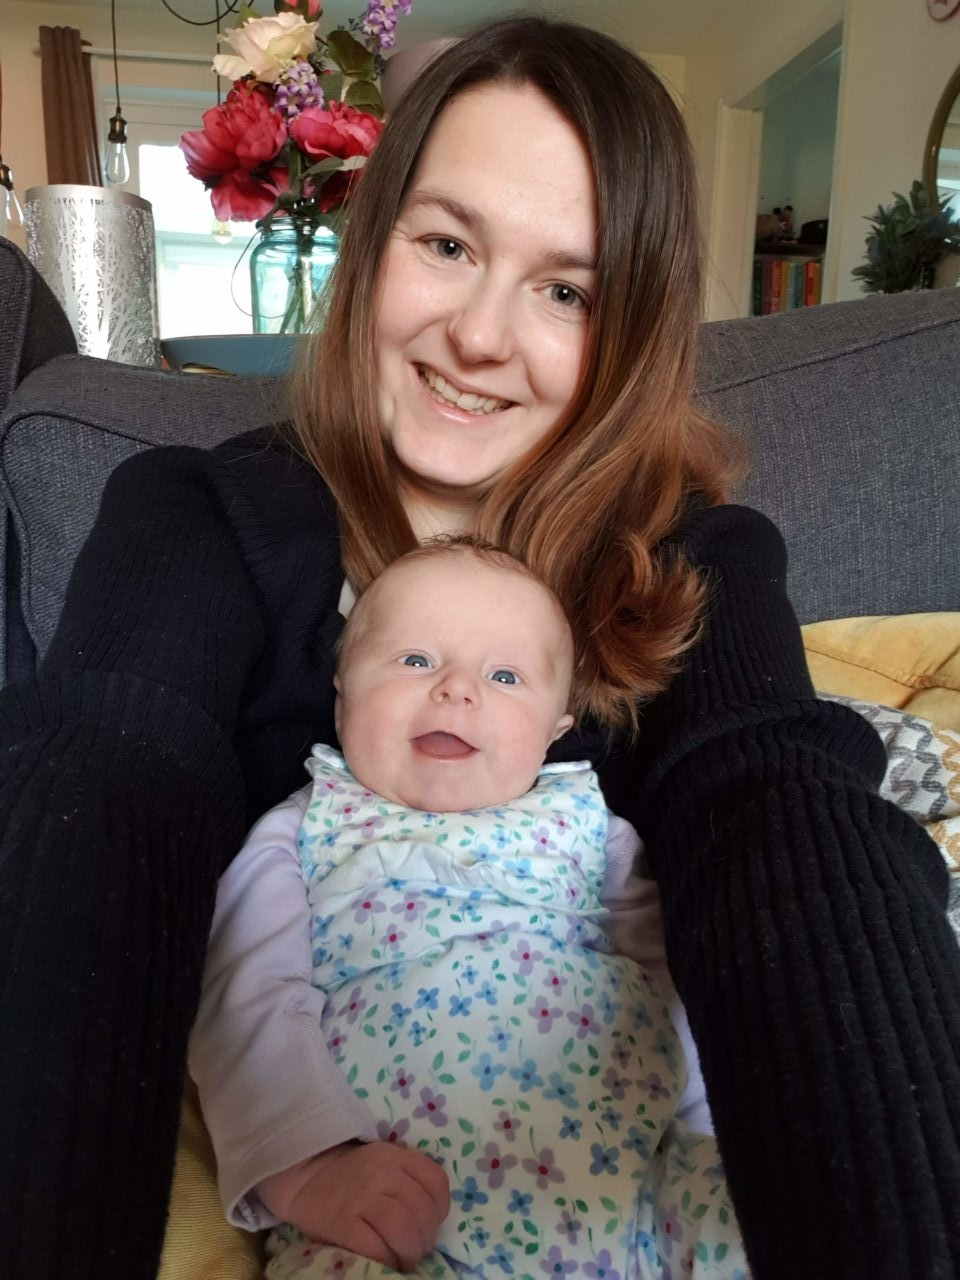 Emmy at 2 months